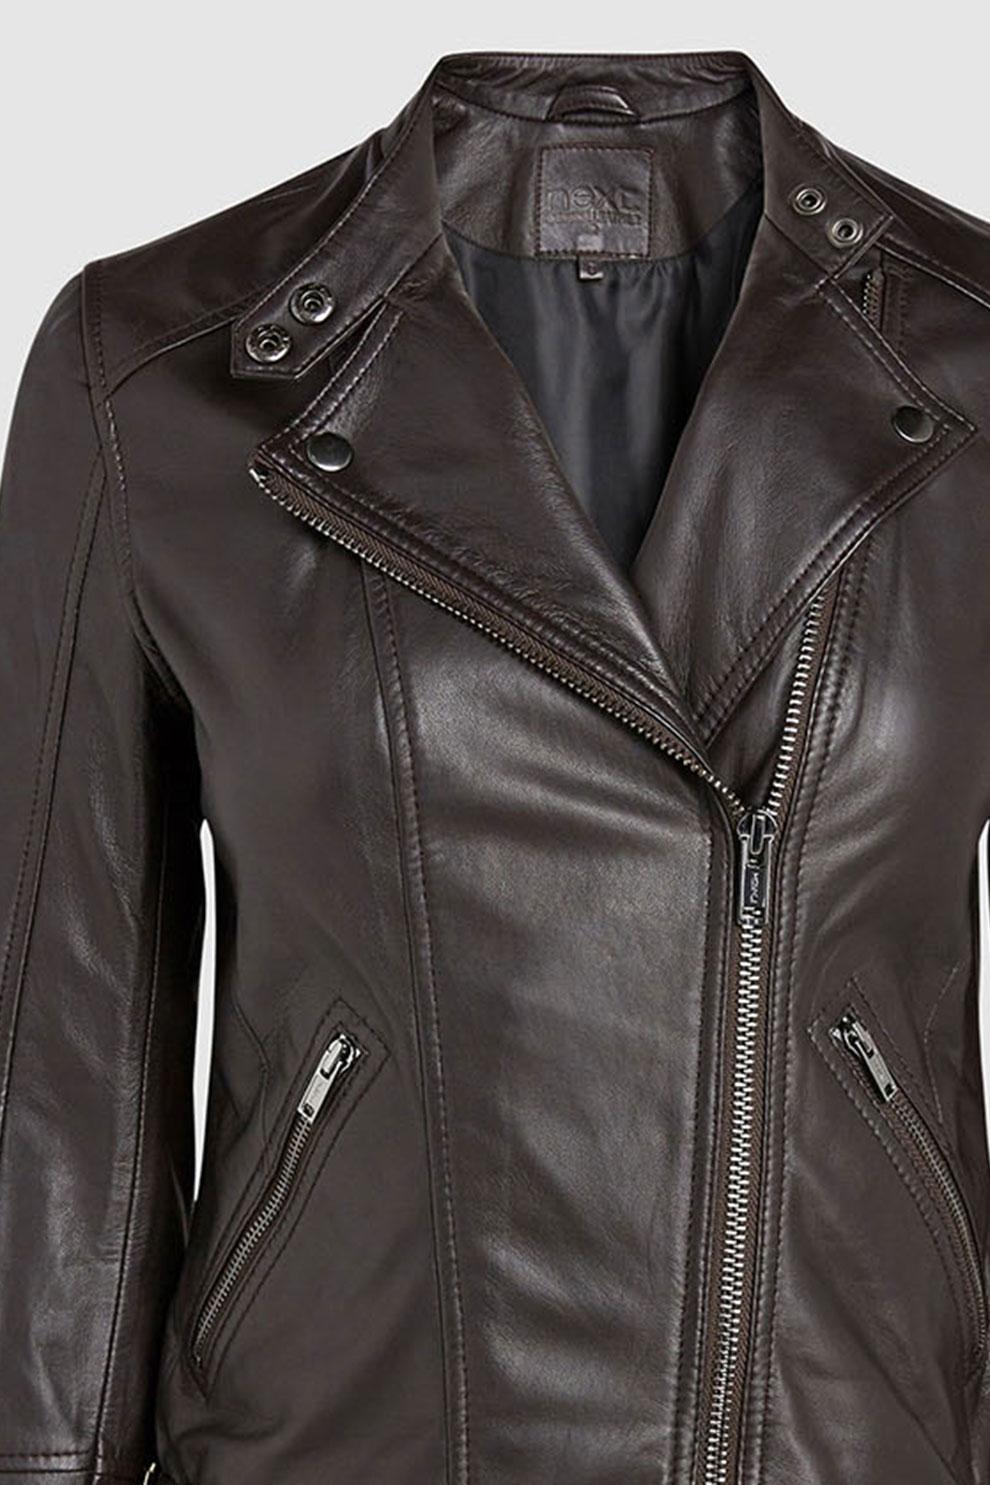 NEXT, Műbőr motoros dzseki, Drapp, 10 eMAG.hu